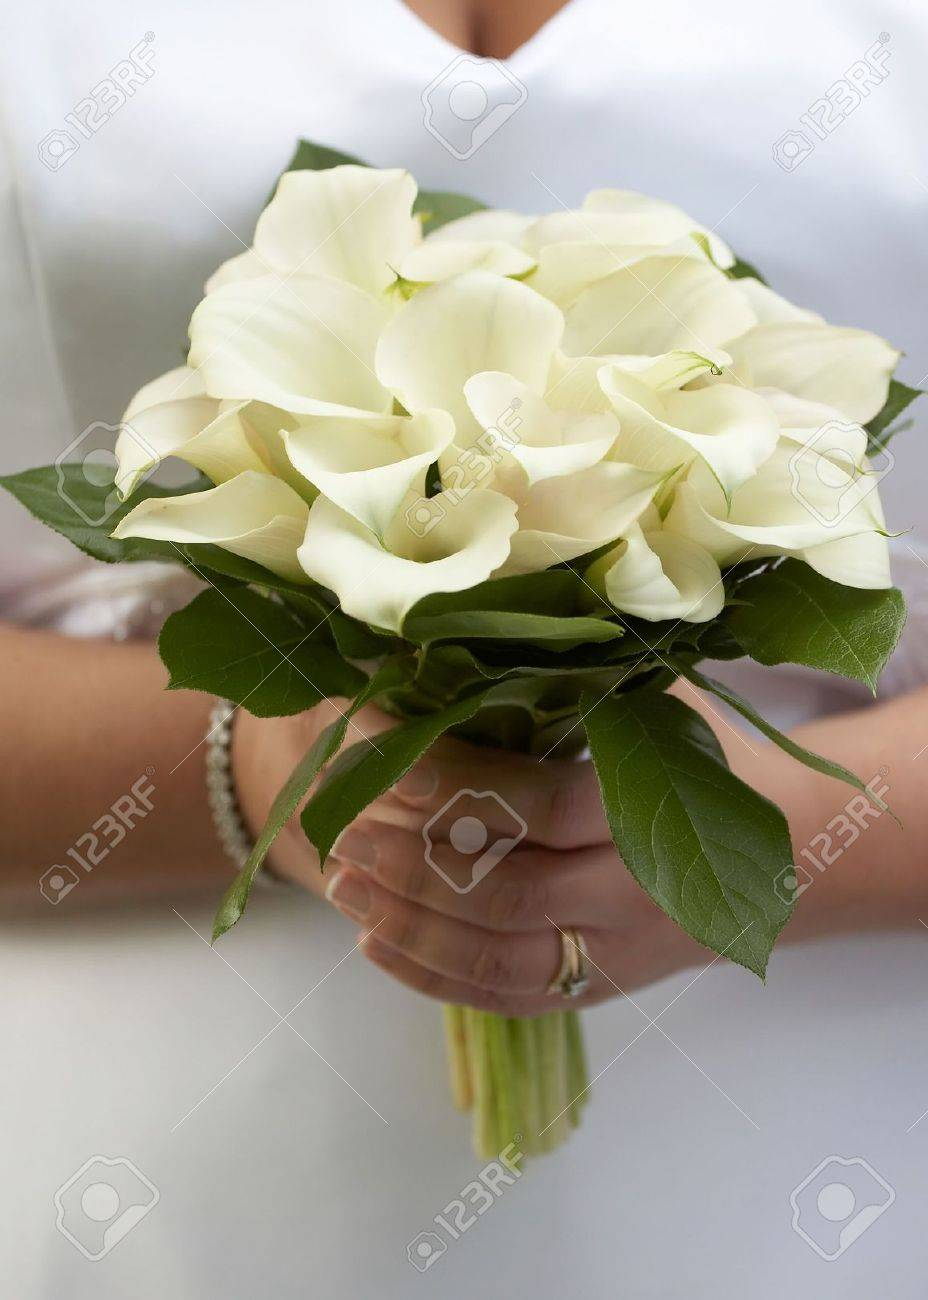 Hands of bride holding wedding bouquet of white calla lilies stock hands of bride holding wedding bouquet of white calla lilies stock photo 4015232 izmirmasajfo